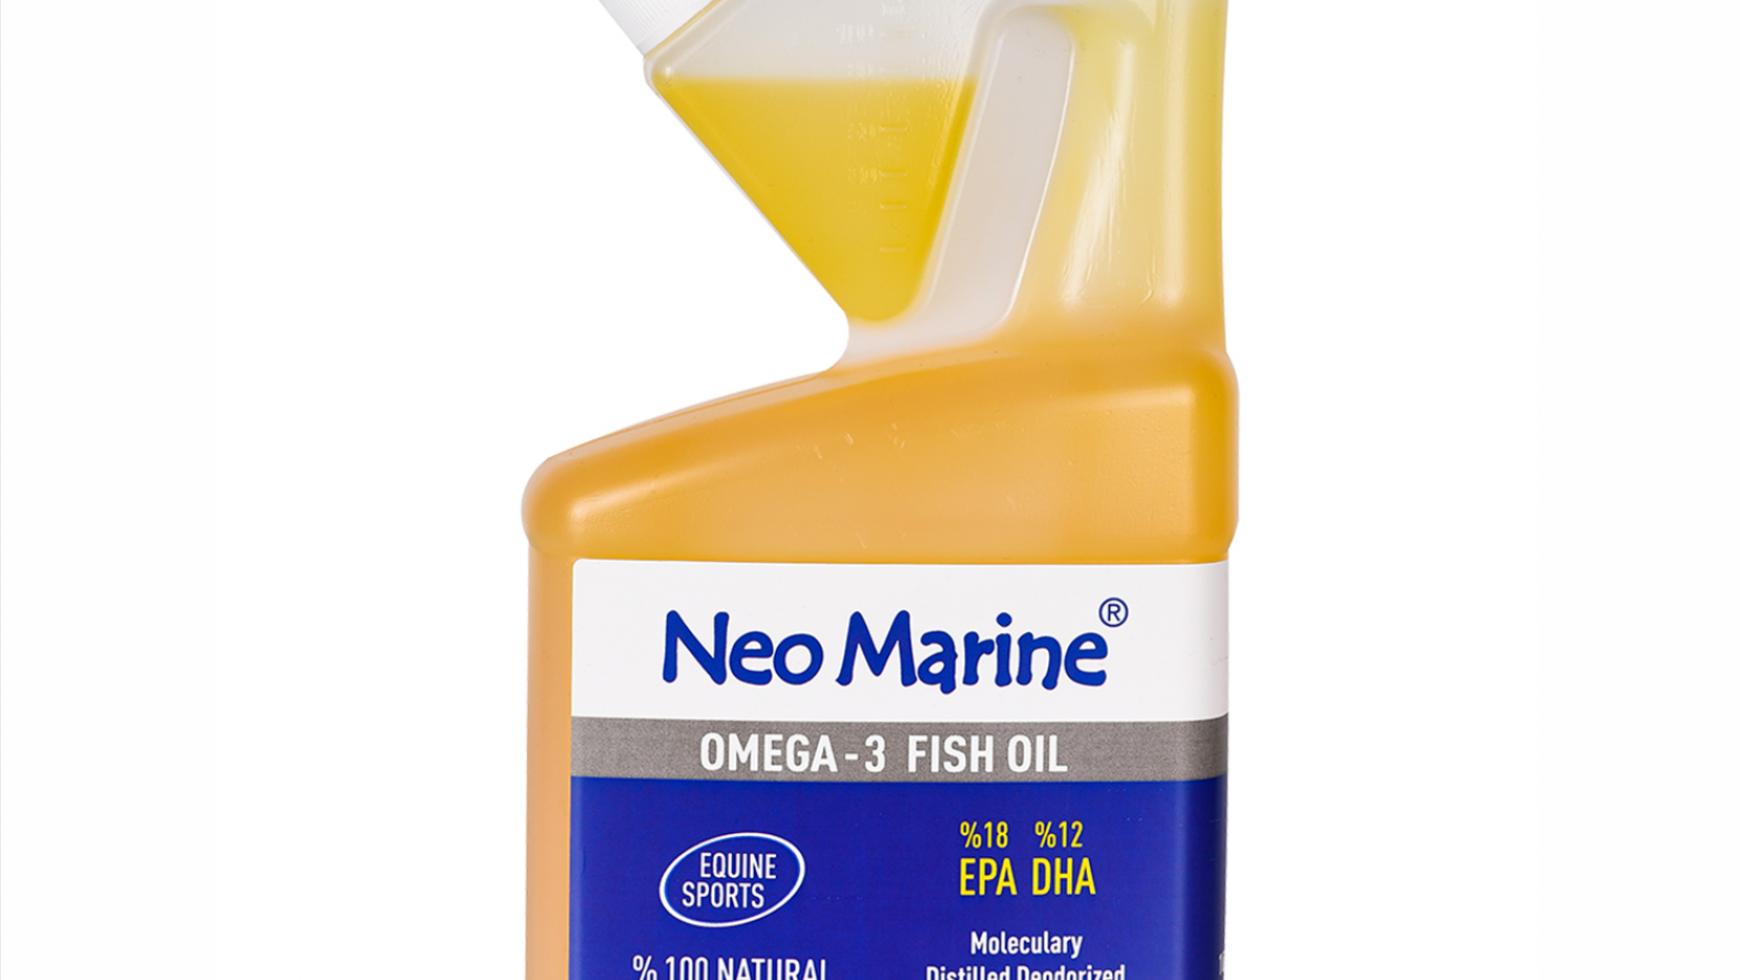 NEO MARINE OMEGA-3 FISH OIL